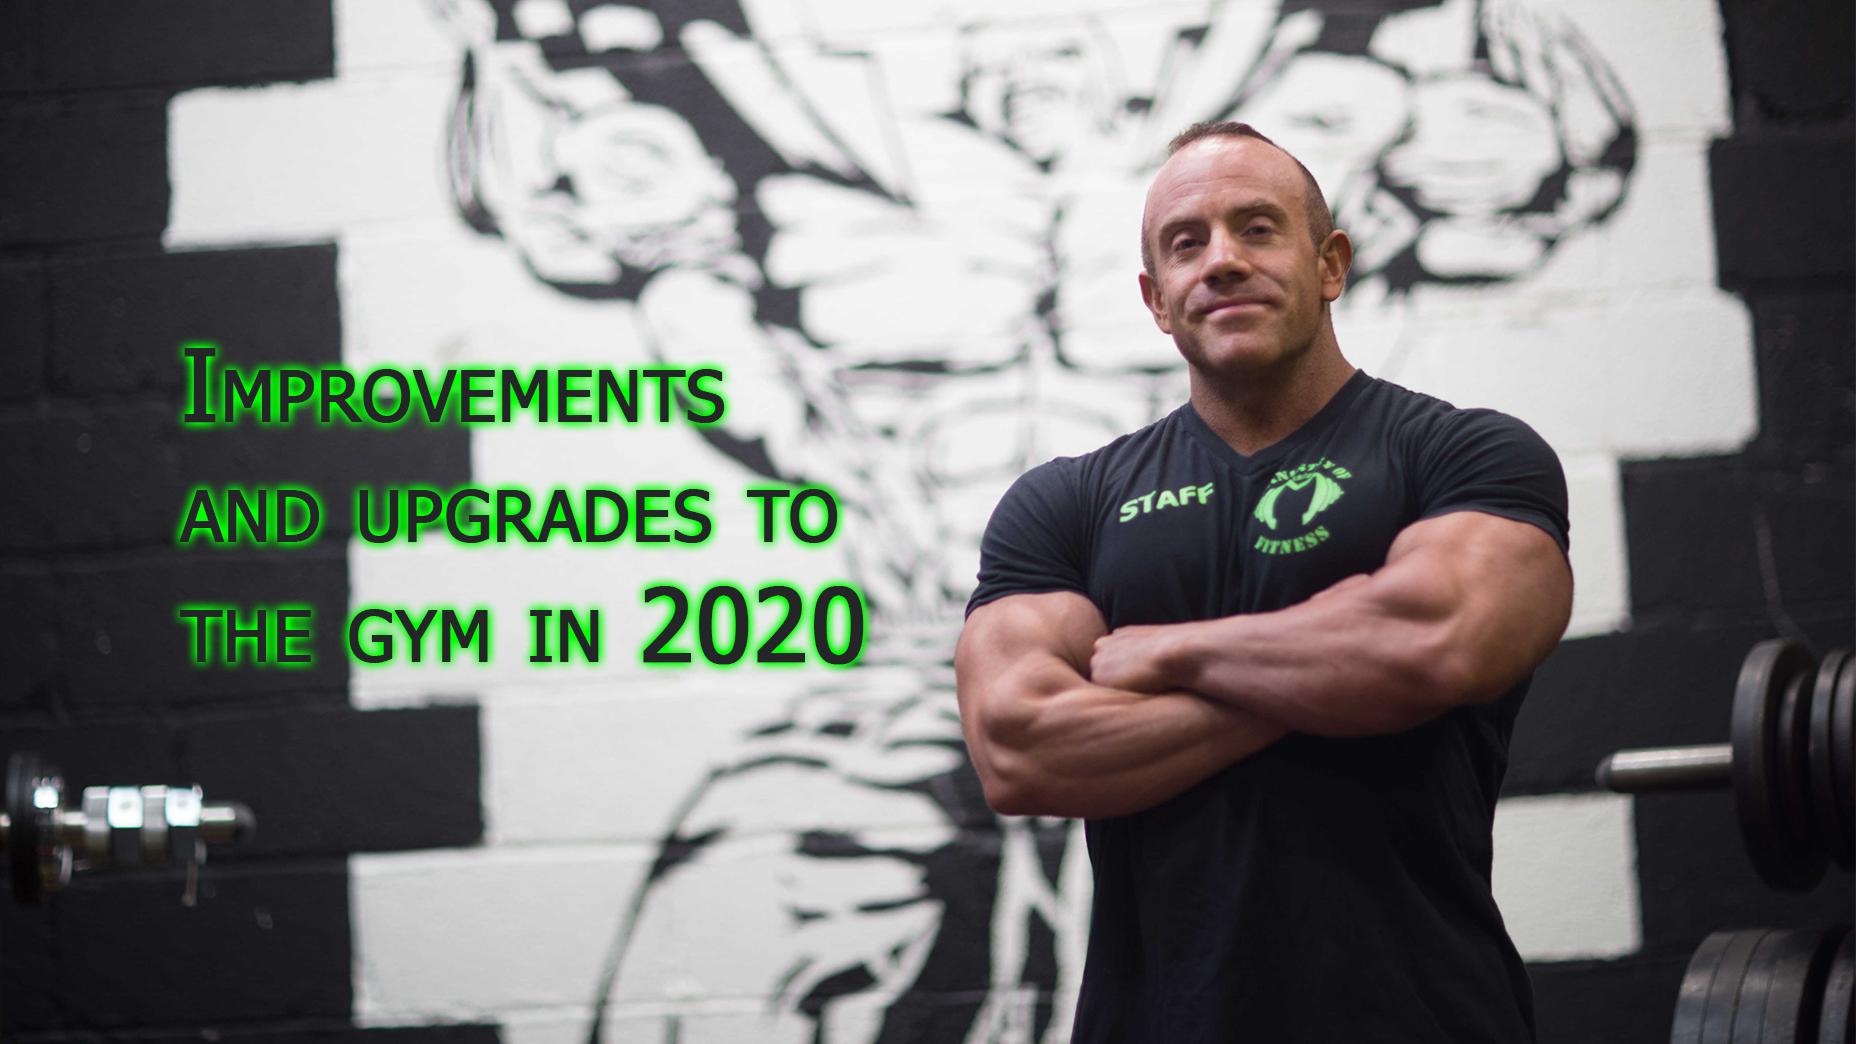 Upgrades-in-2020YBR-Consult-2